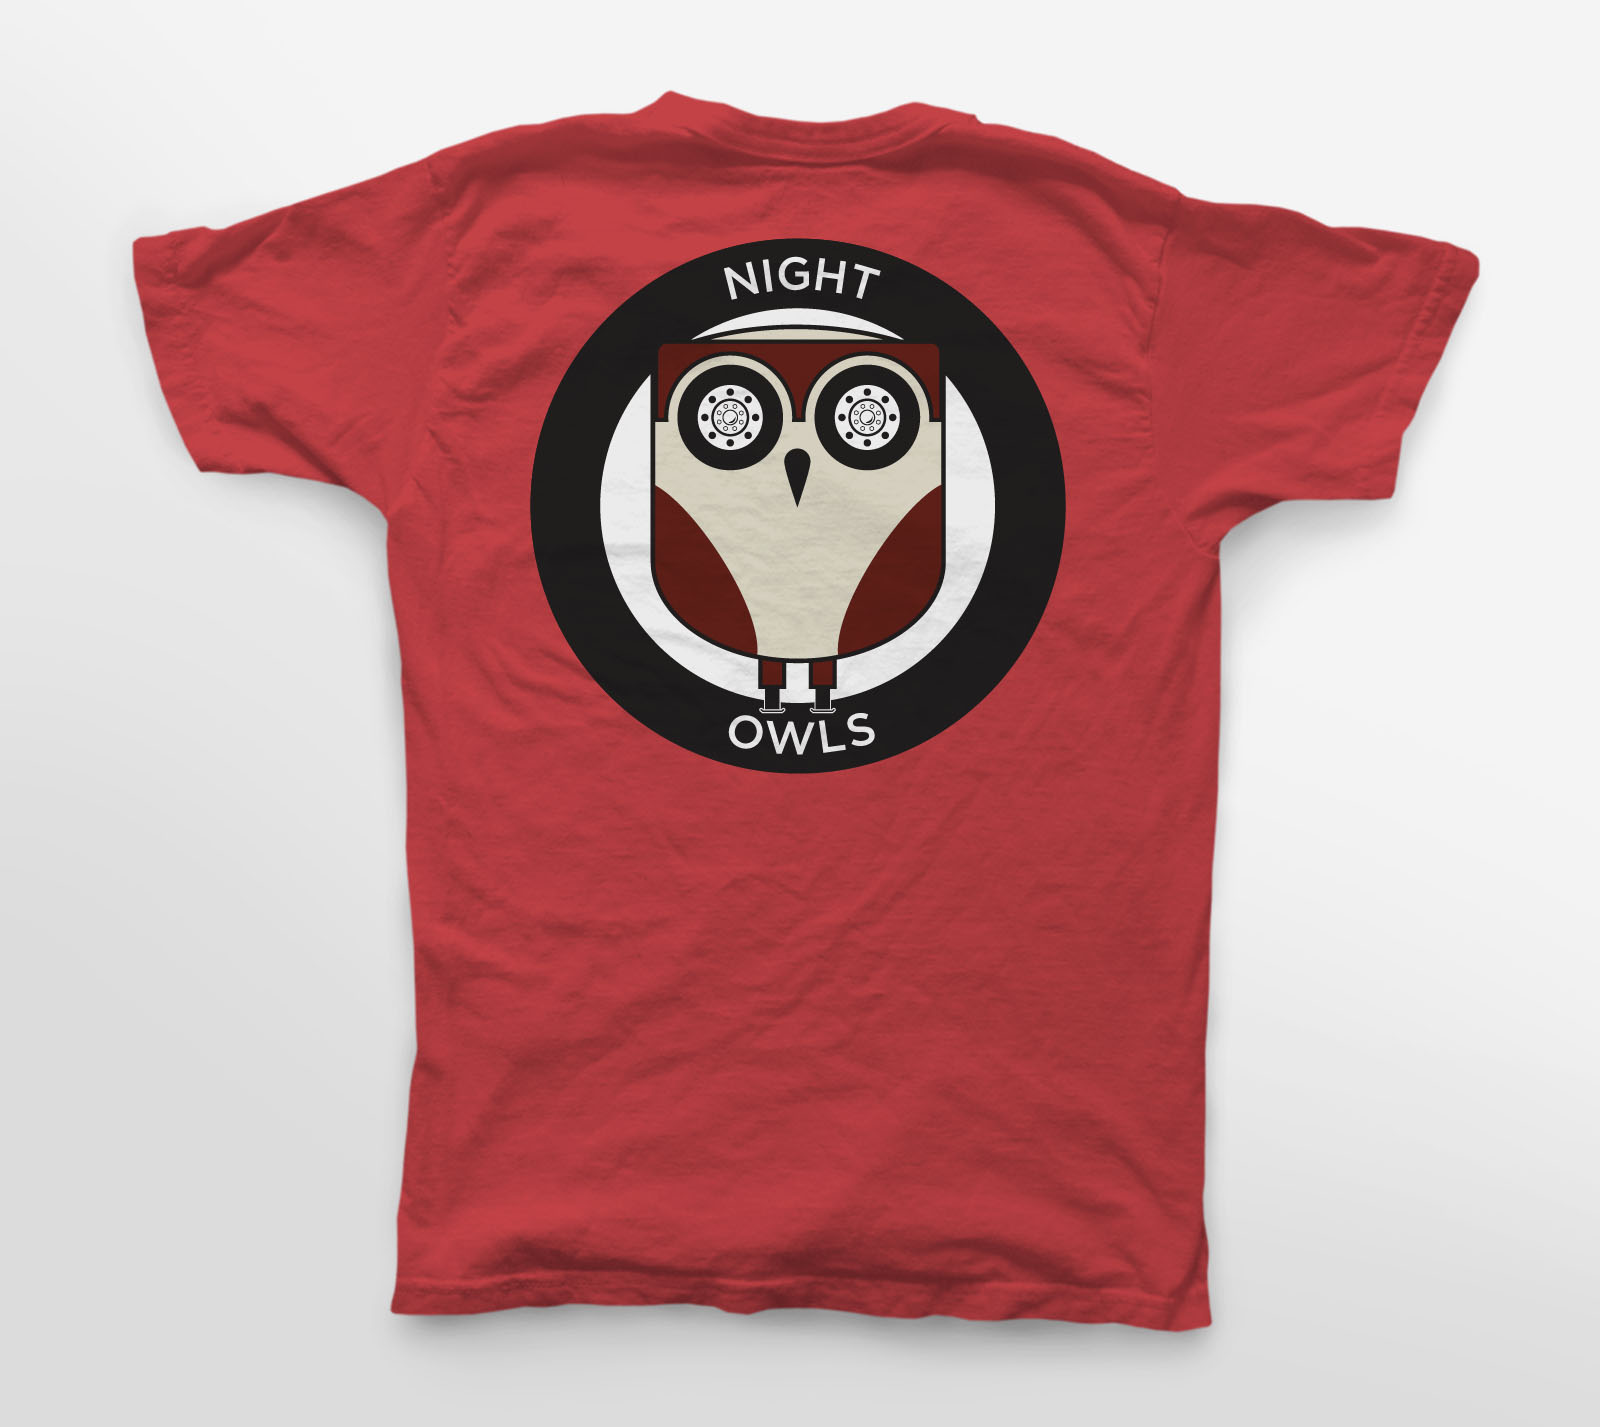 McLane-night-owls.jpg